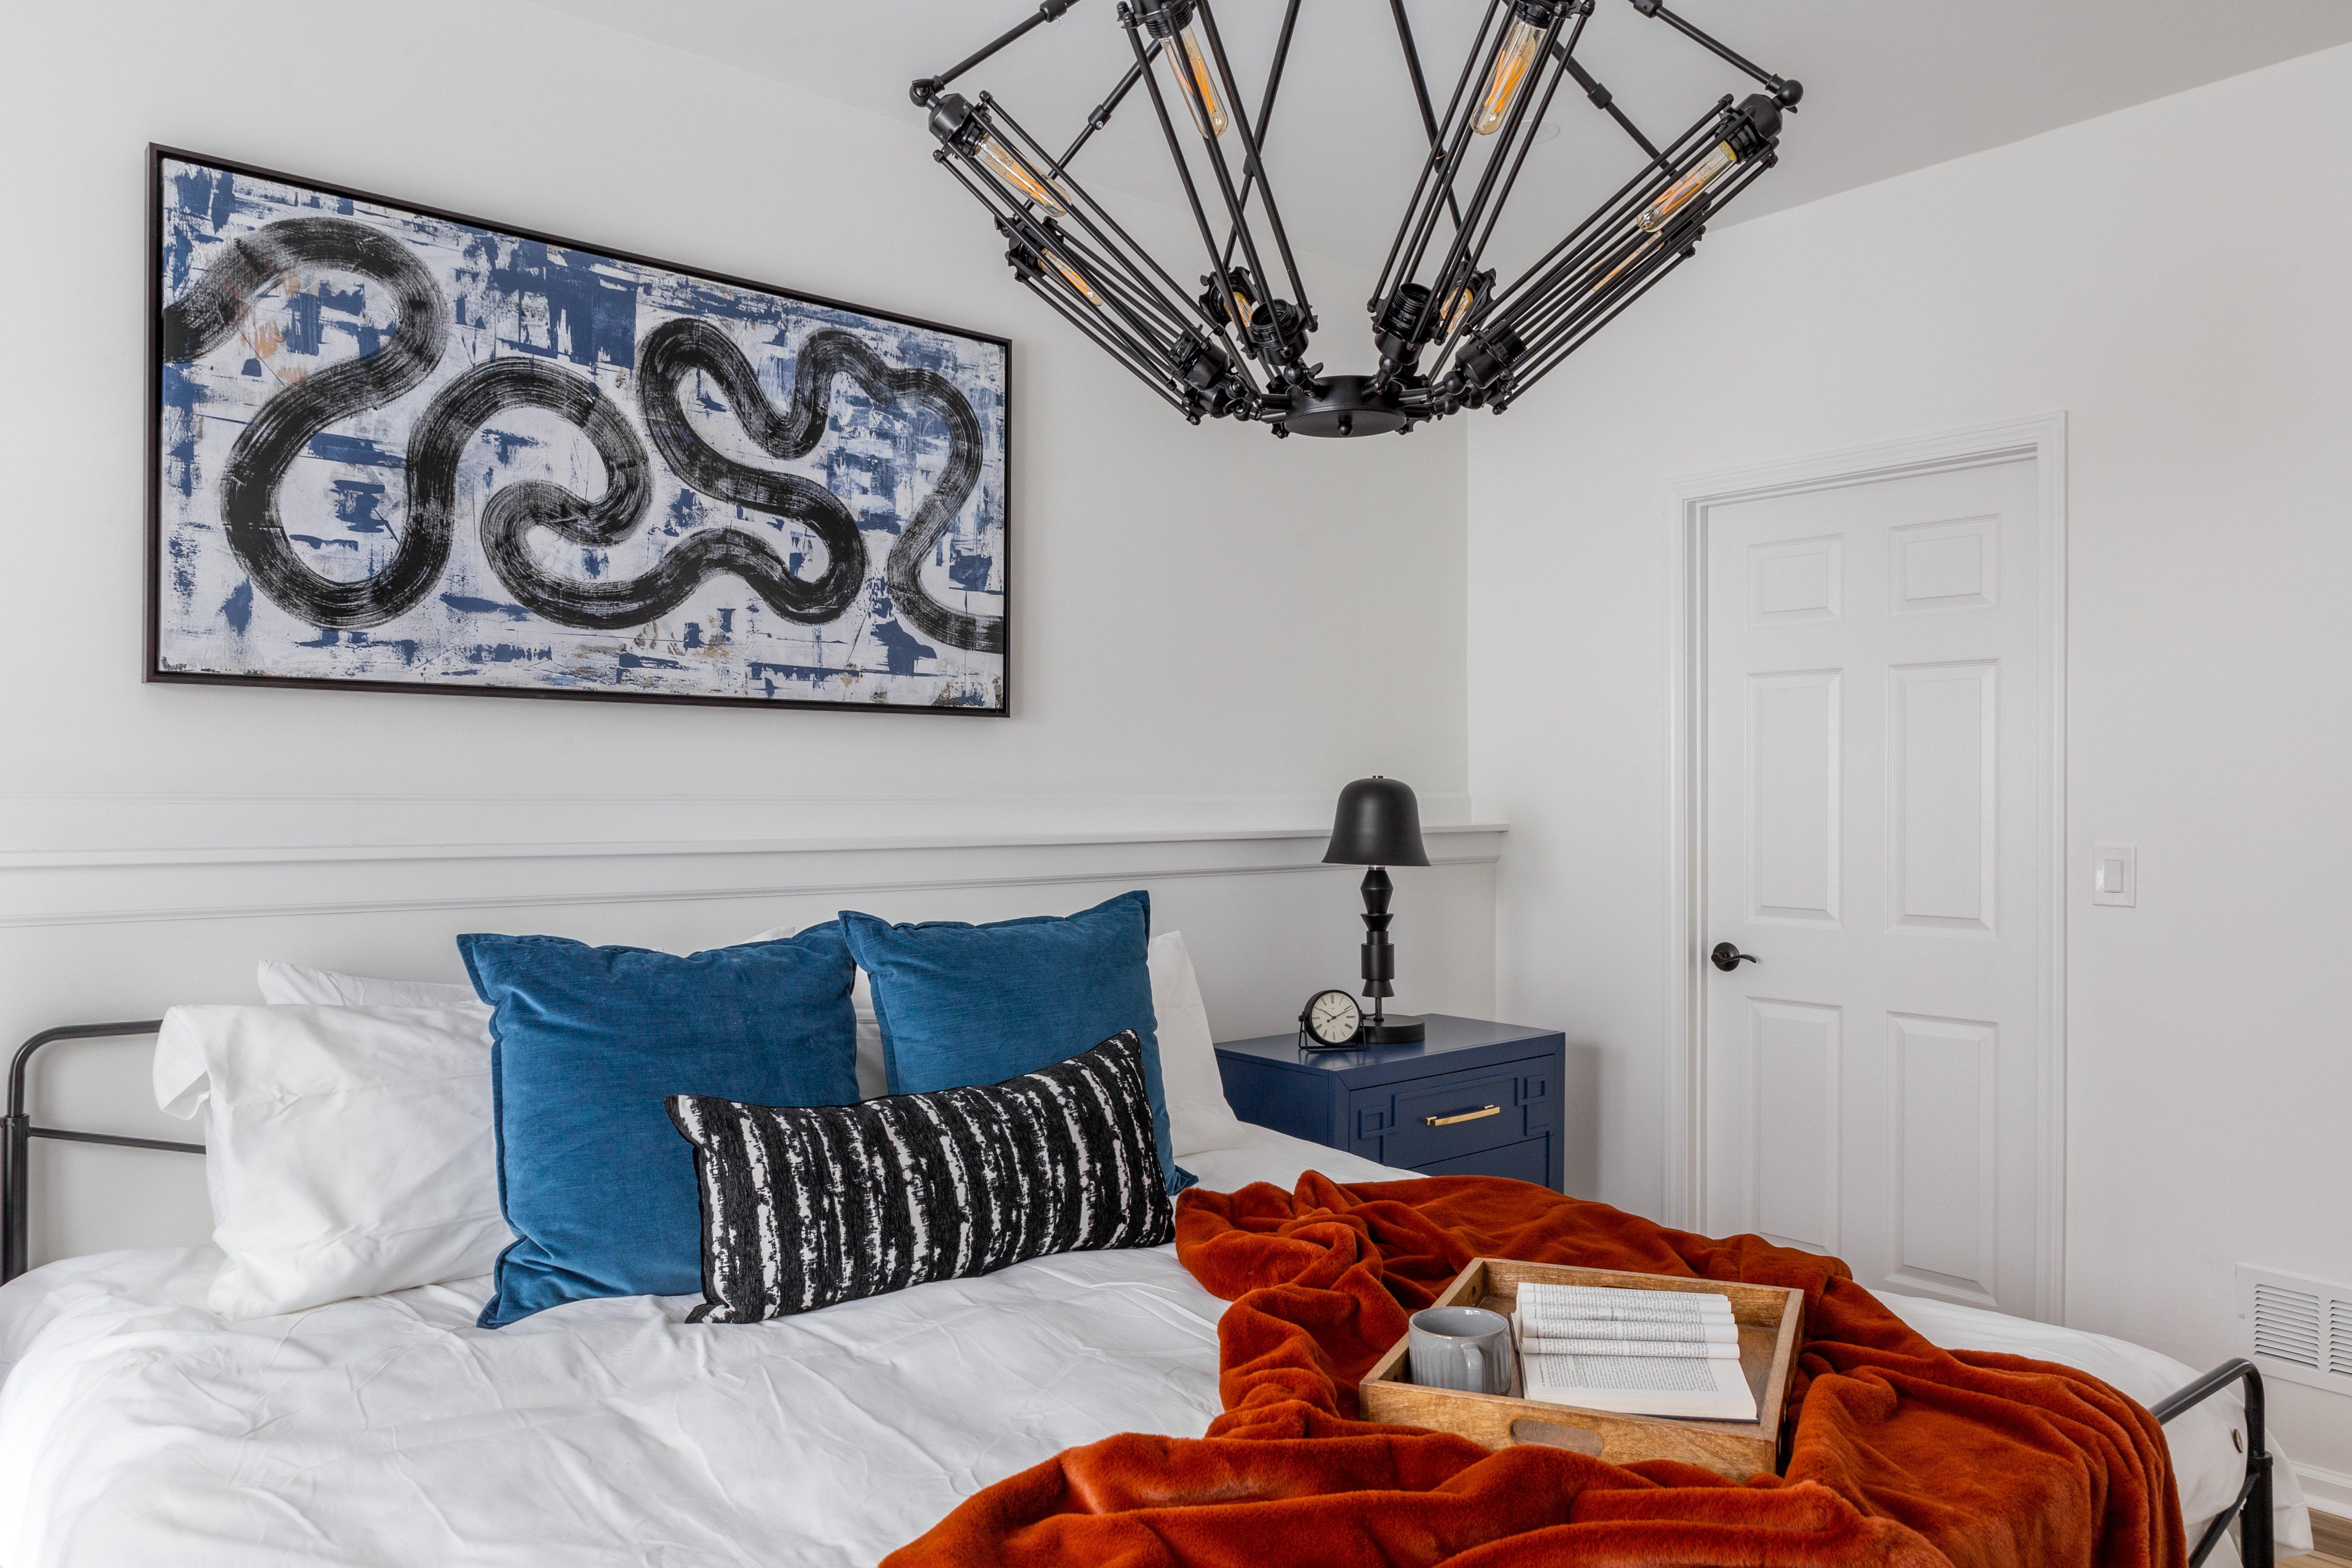 18 bedroom 1swim-meet-2-92-HDR.jpg